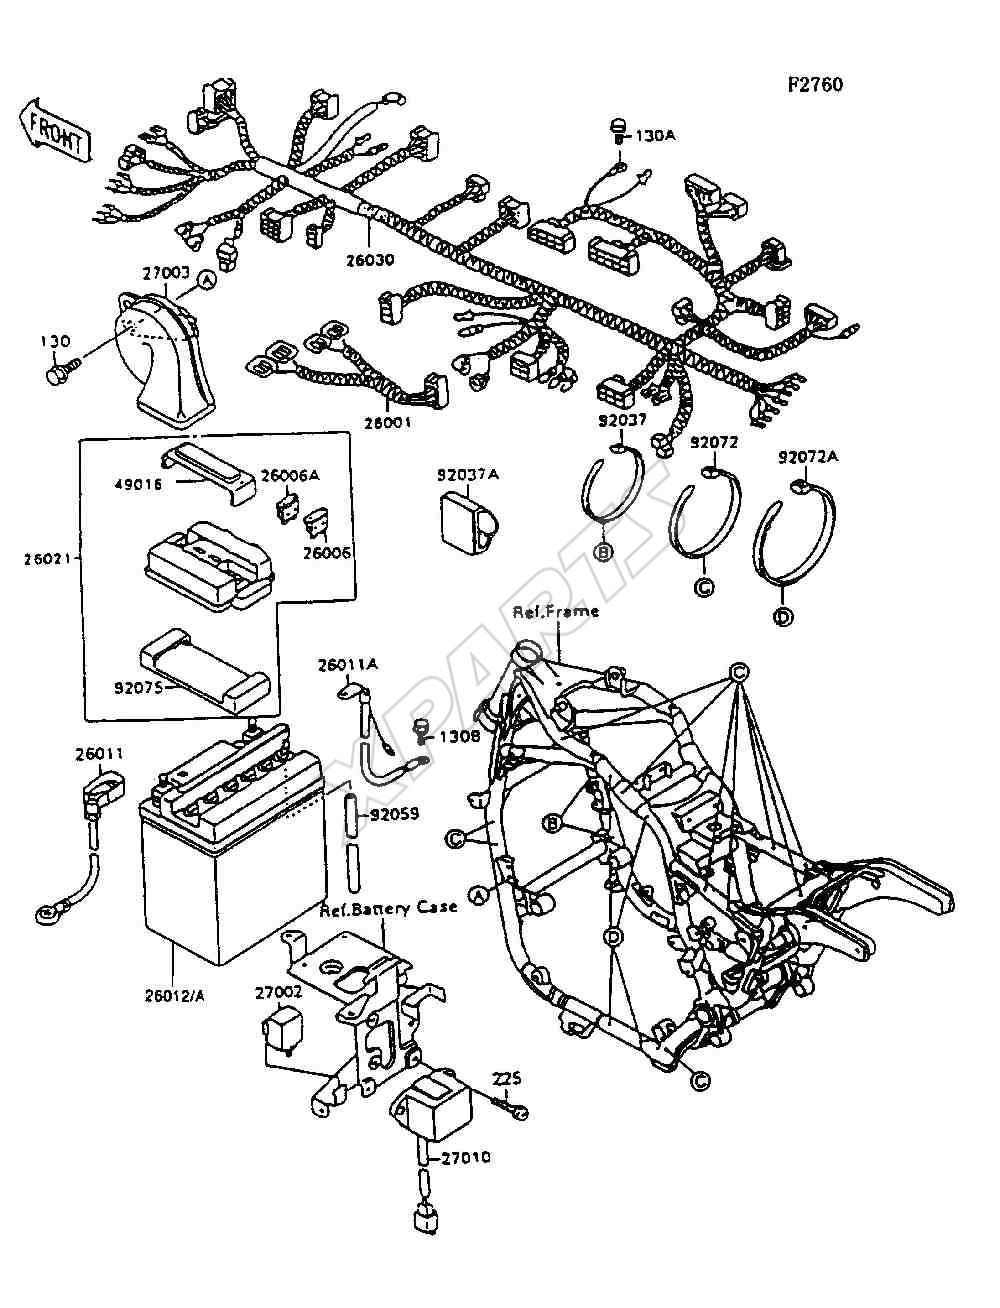 6C46FF1 Kawasaki Vulcan 1500 Classic Wiring Diagram